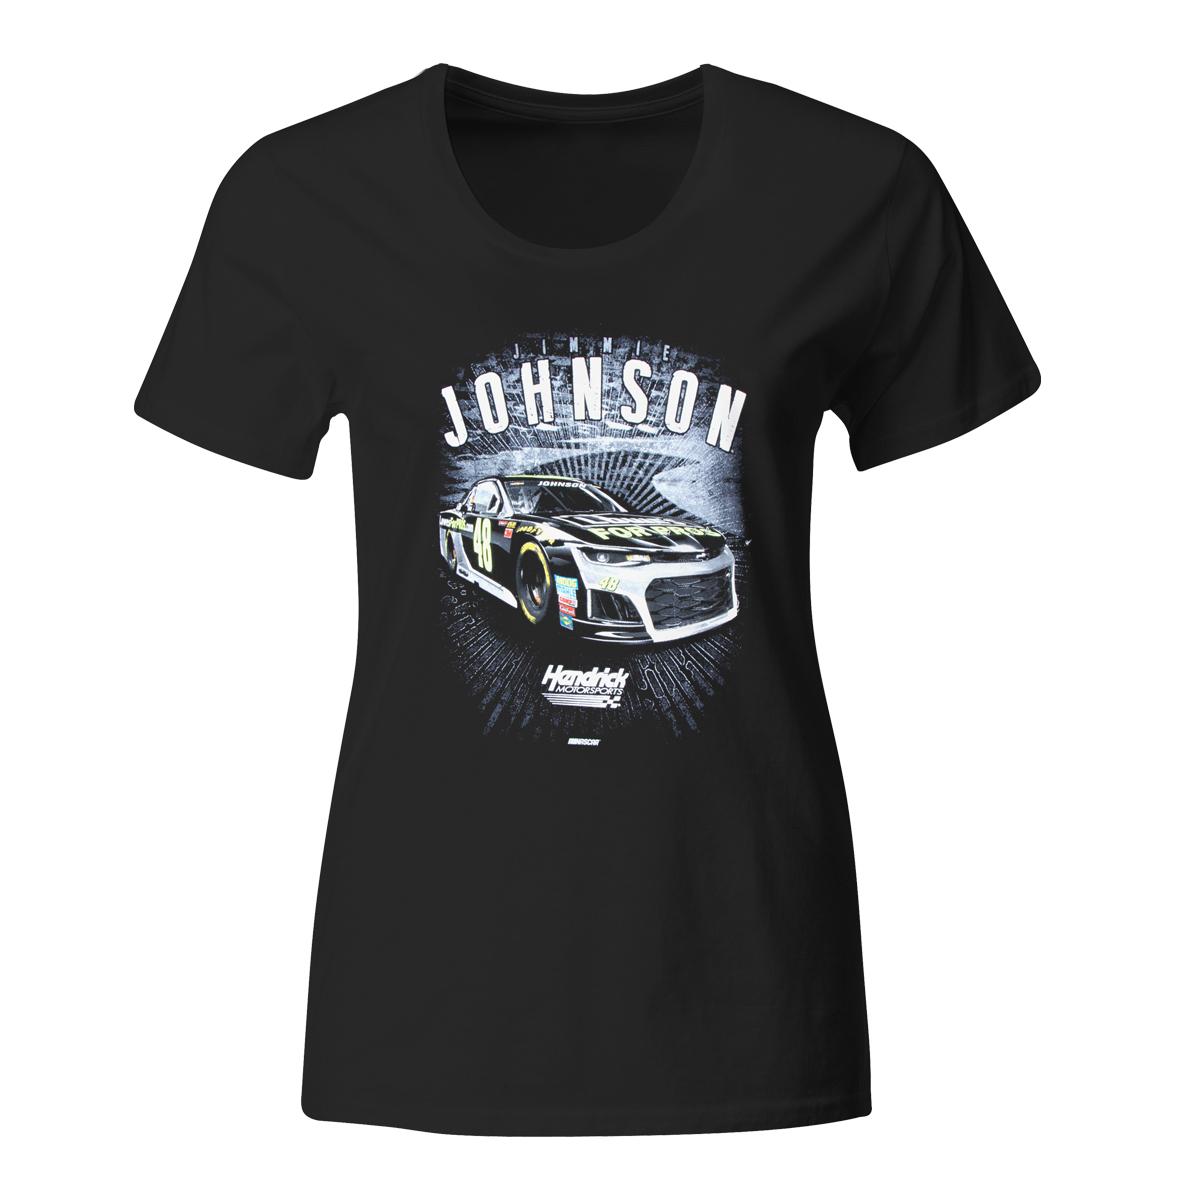 Jimmie Johnson #48 2018 Lowe's Ladies Acceleration 1-Spot T-shirt